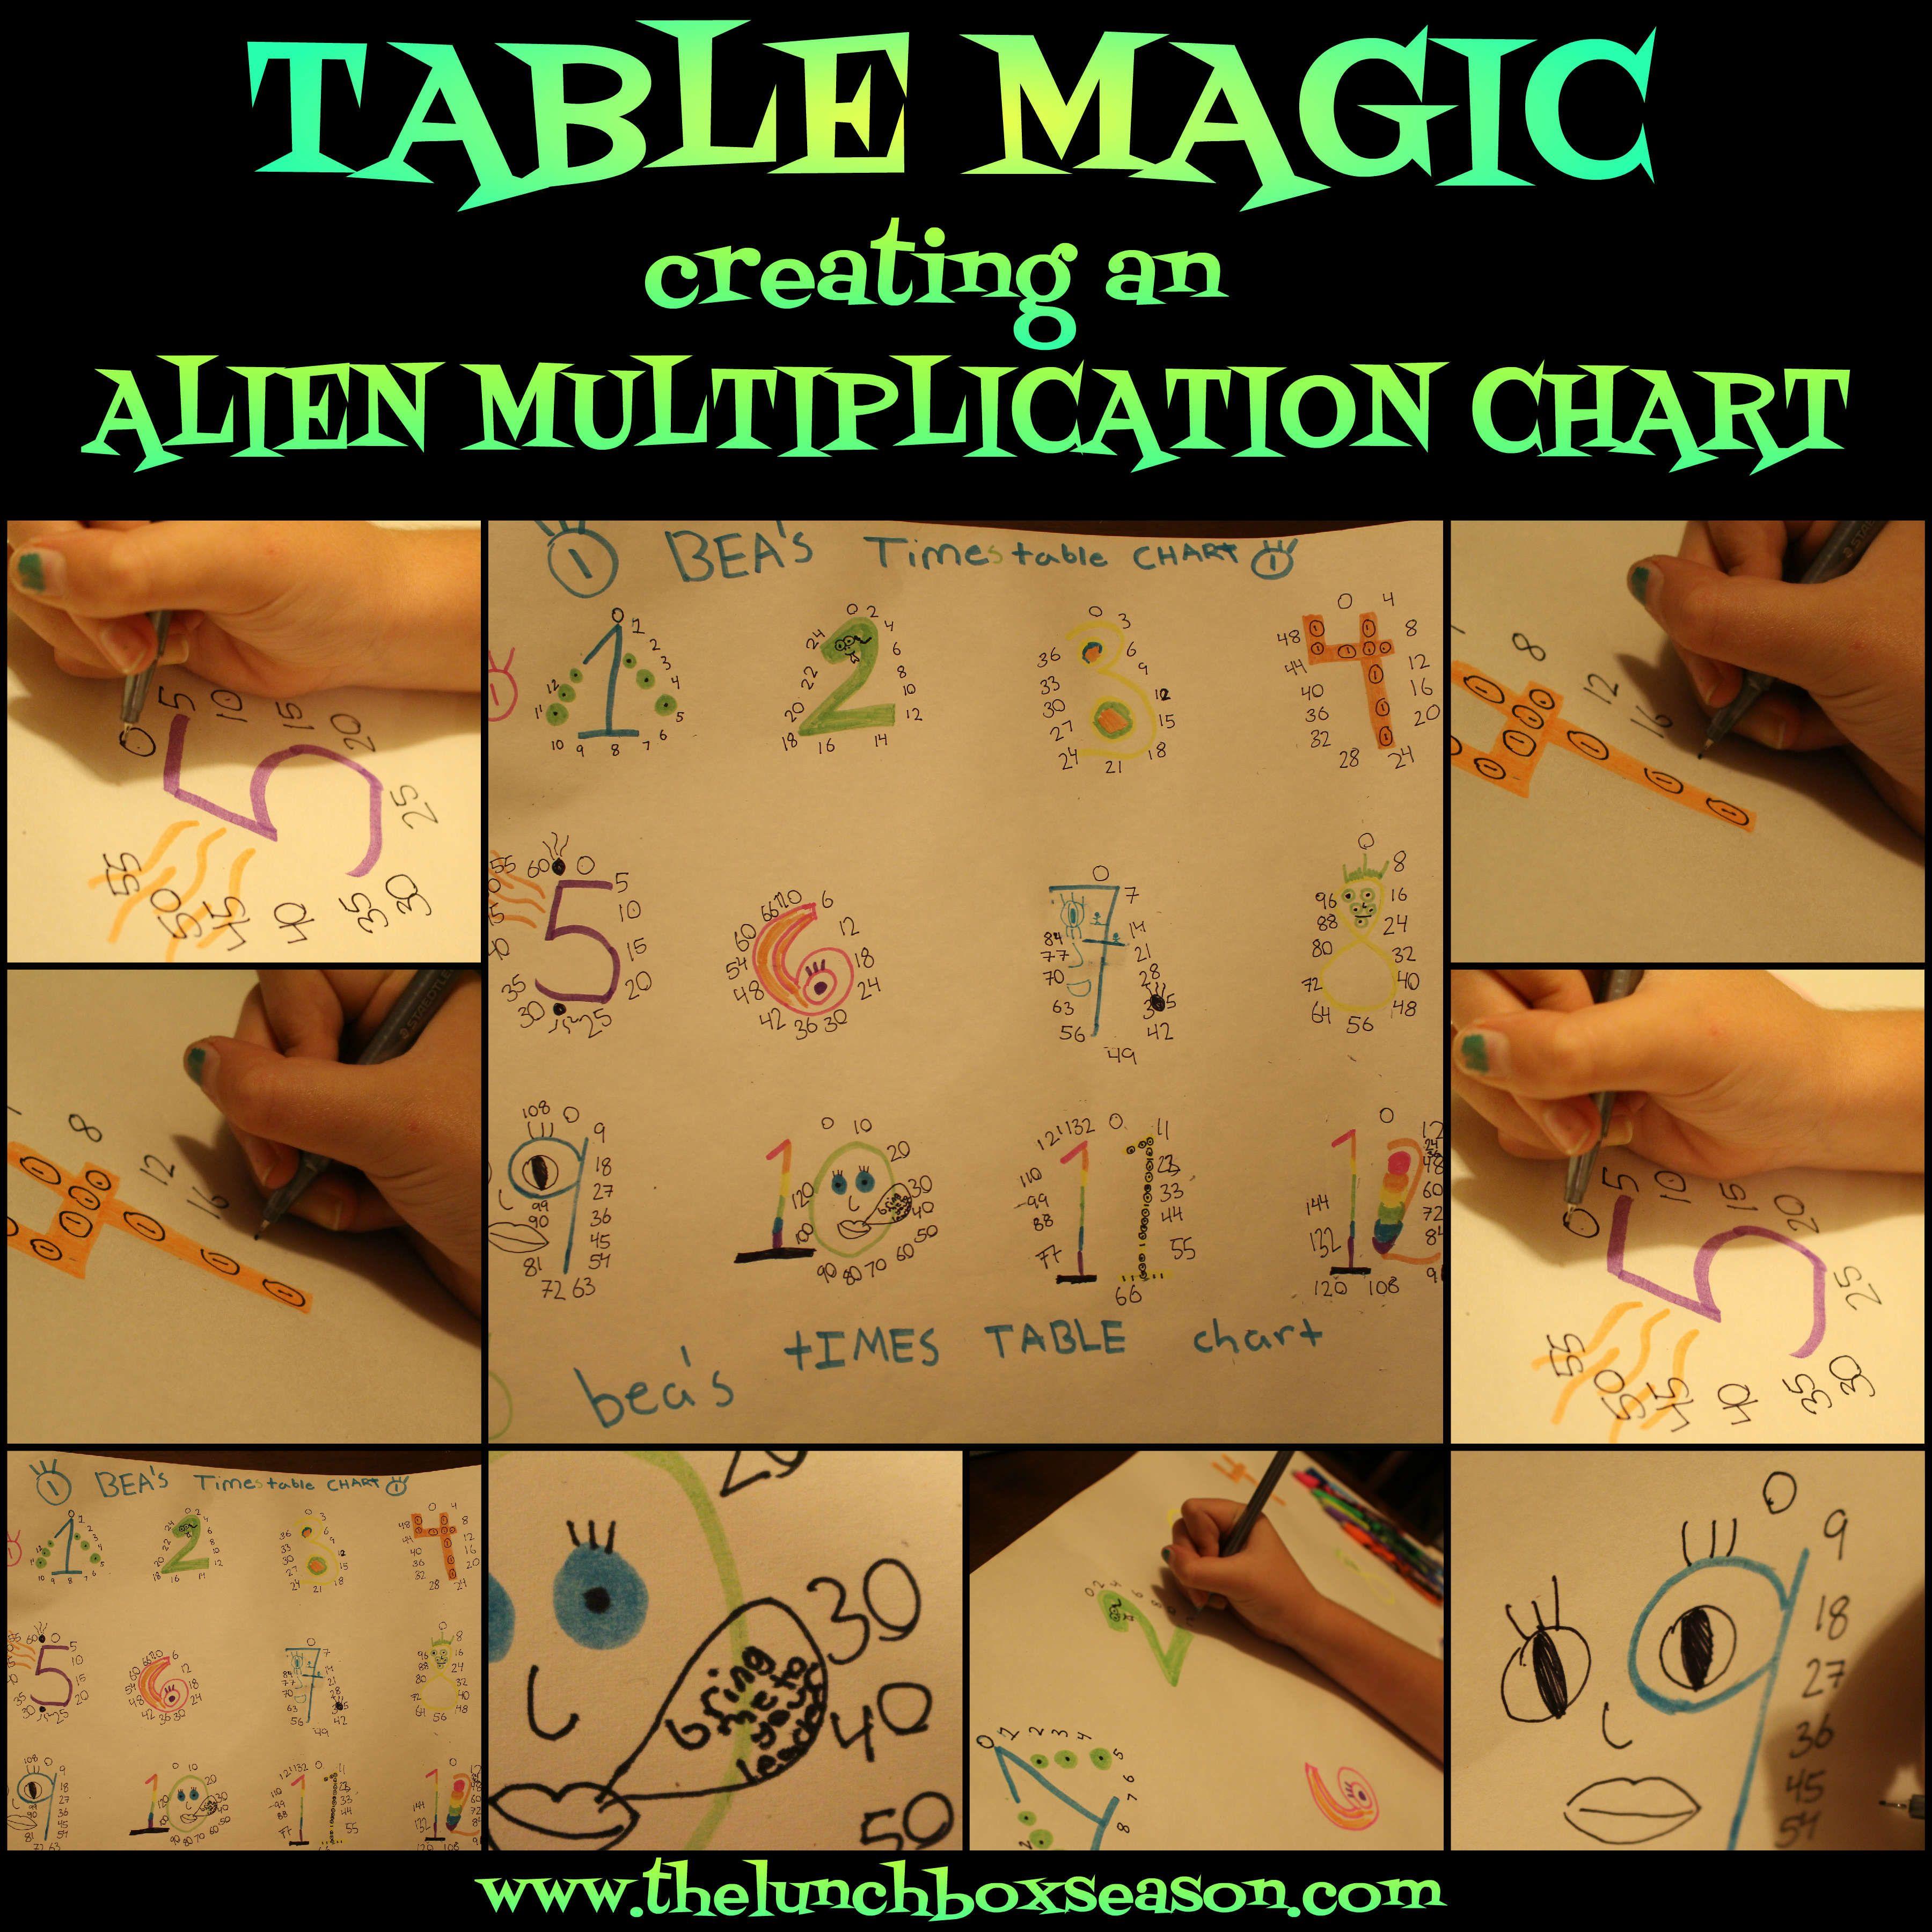 Table Magic Creating An Alien Multiplication Chart